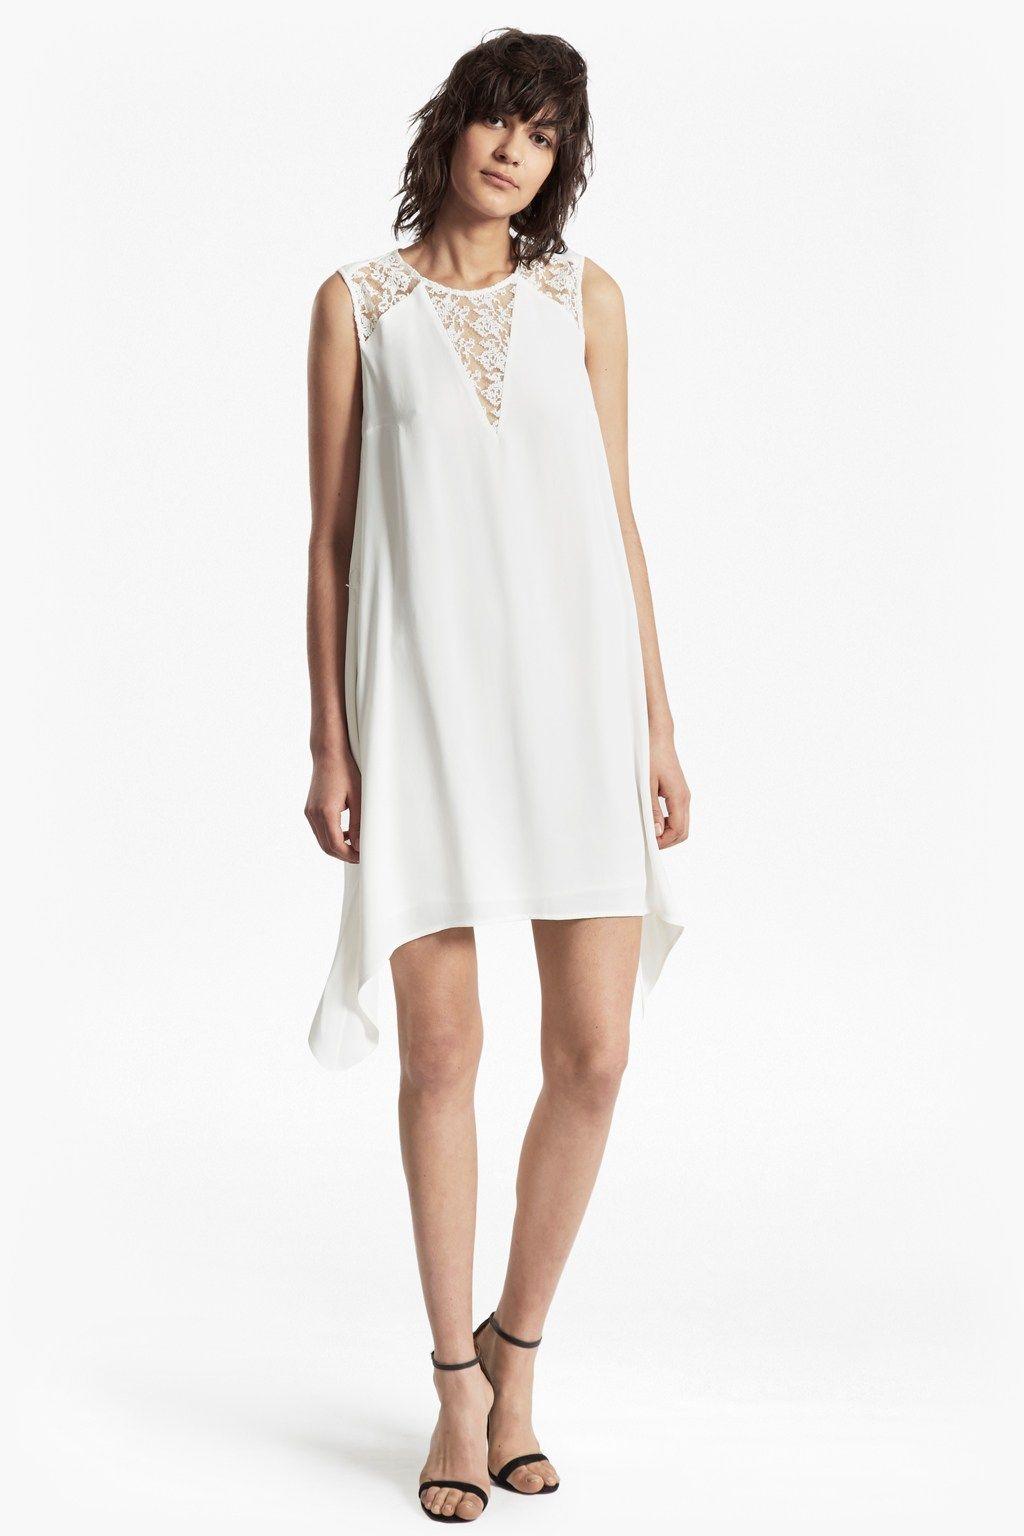 Lioness goddess backless maxi dress white long sleeve